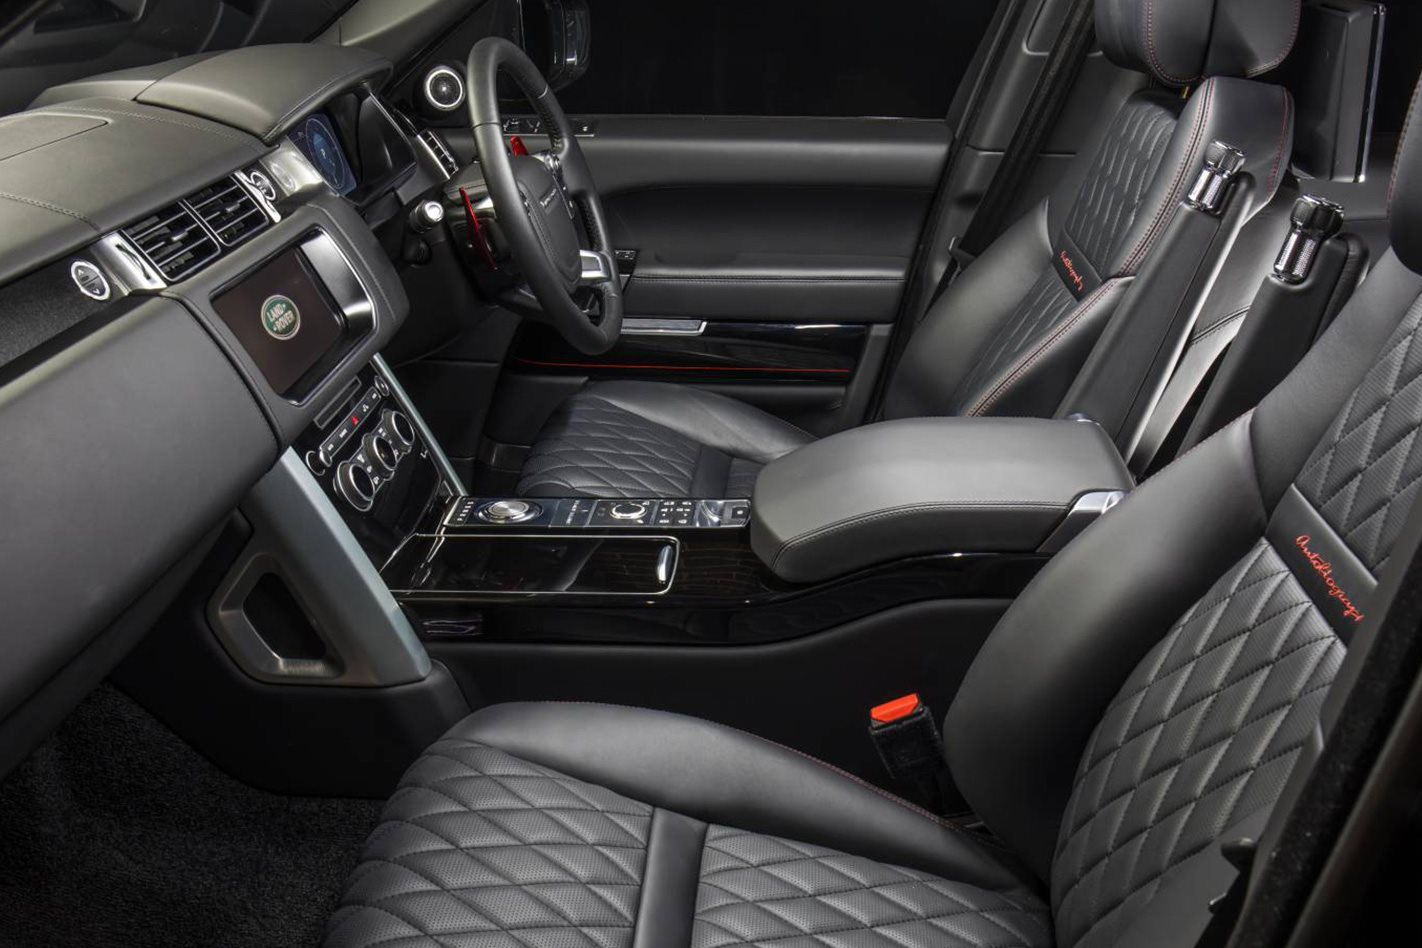 2018-Range-Rover-INTERIOR.jpg